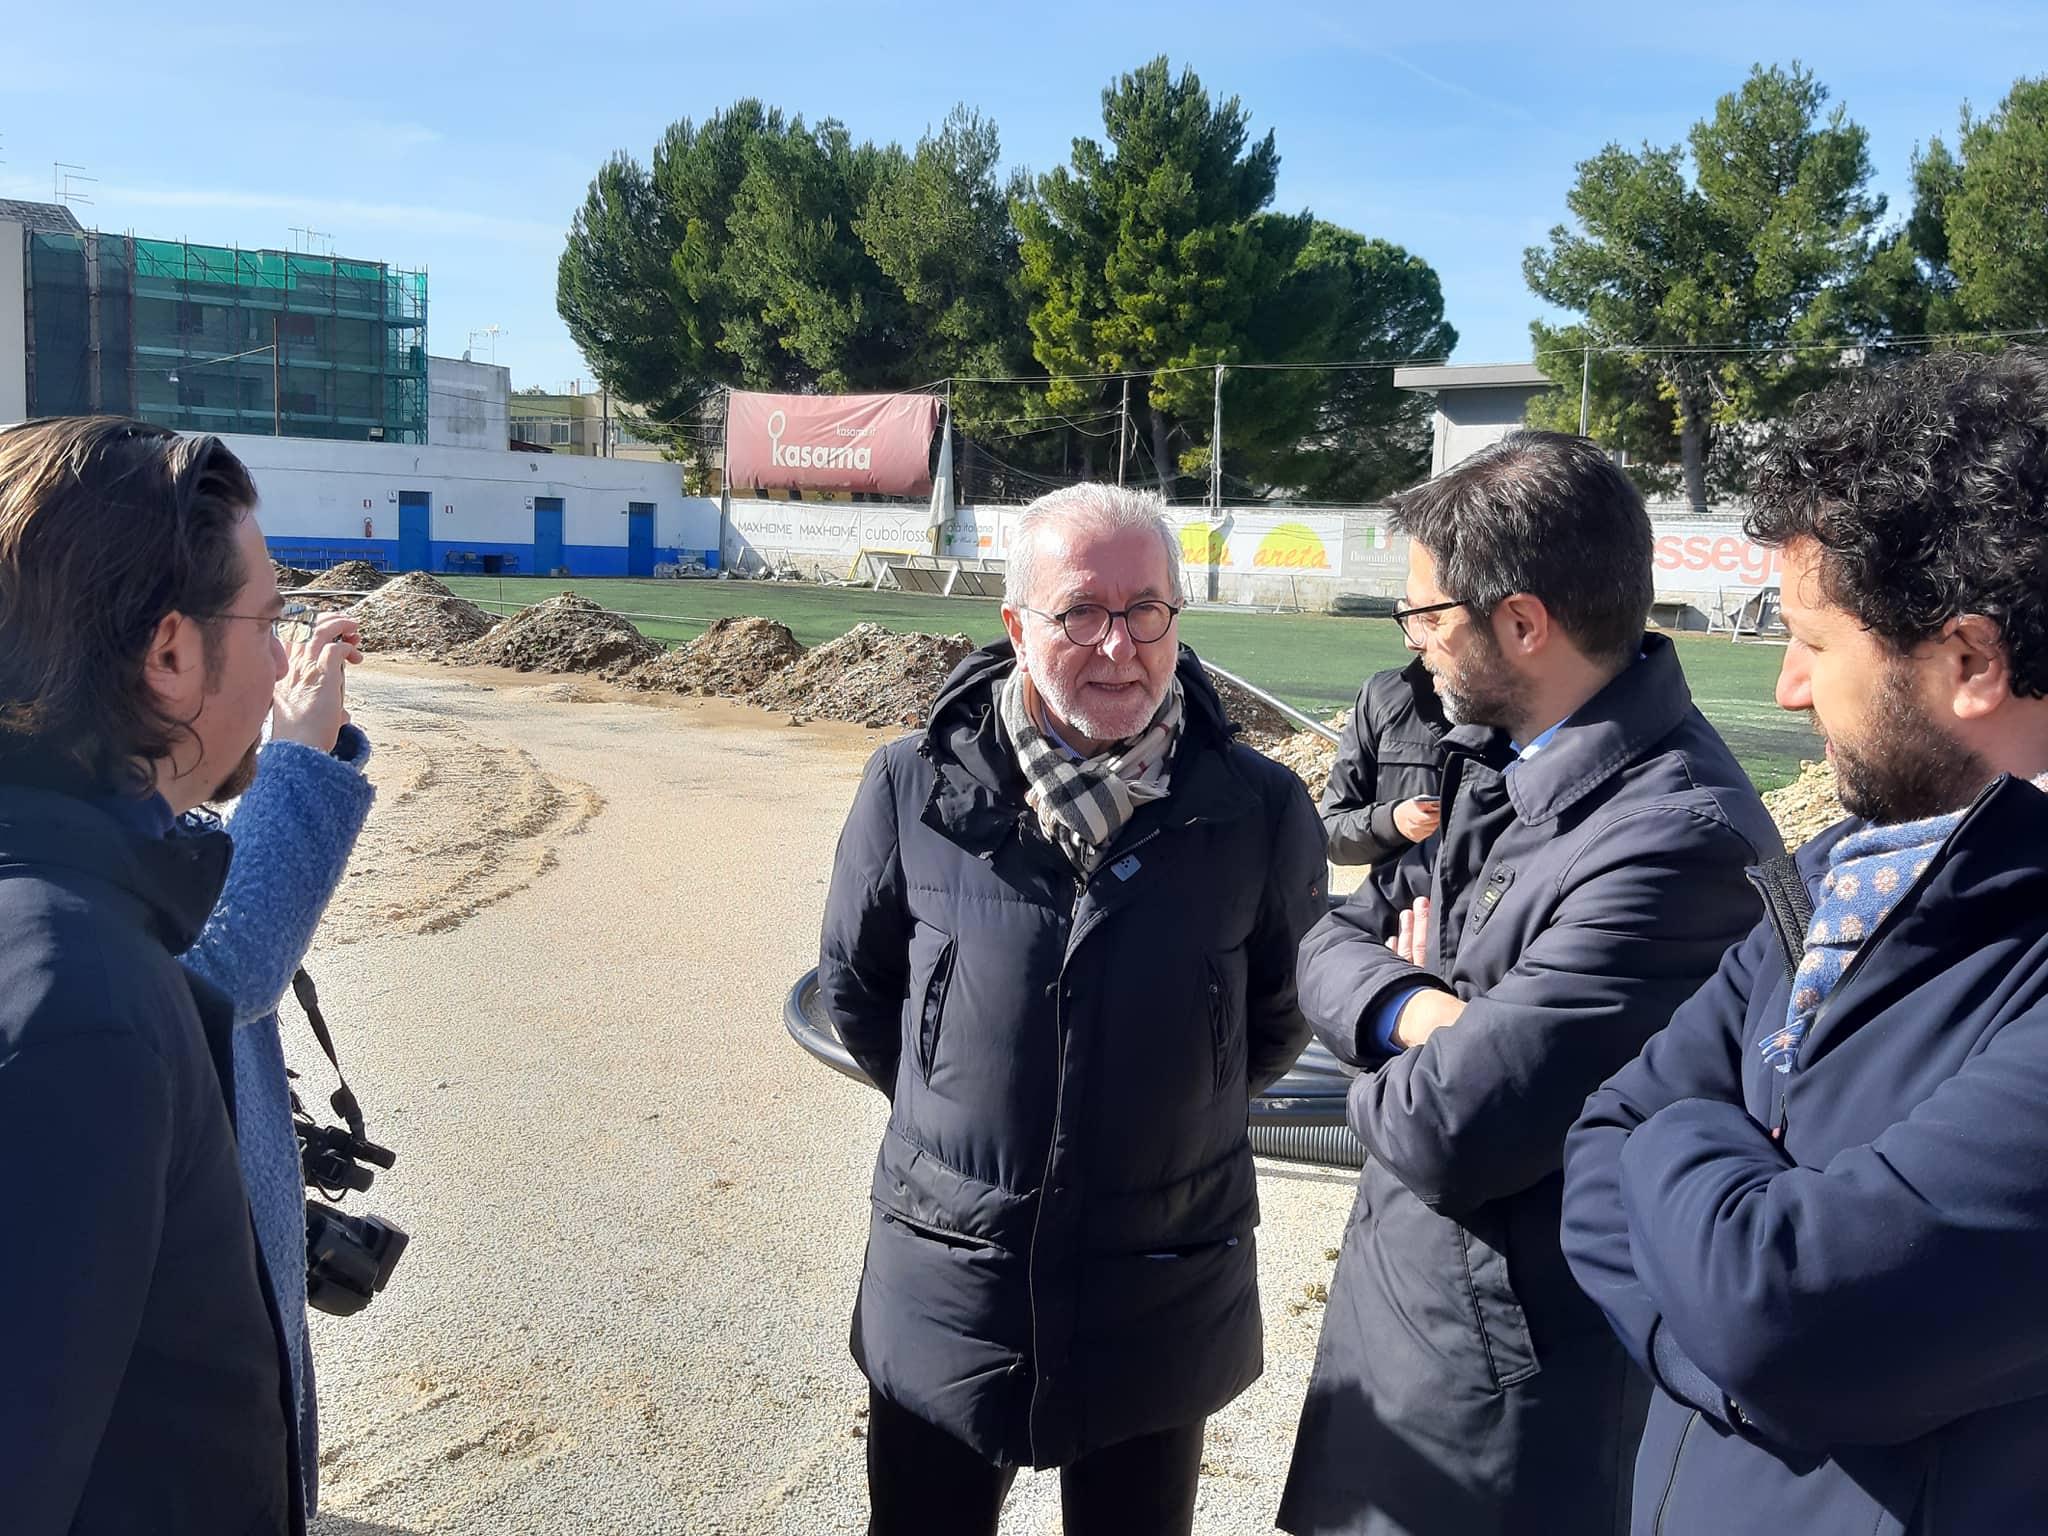 Francavilla fontana stadio verifica dei lavori con for Magri arreda francavilla fontana